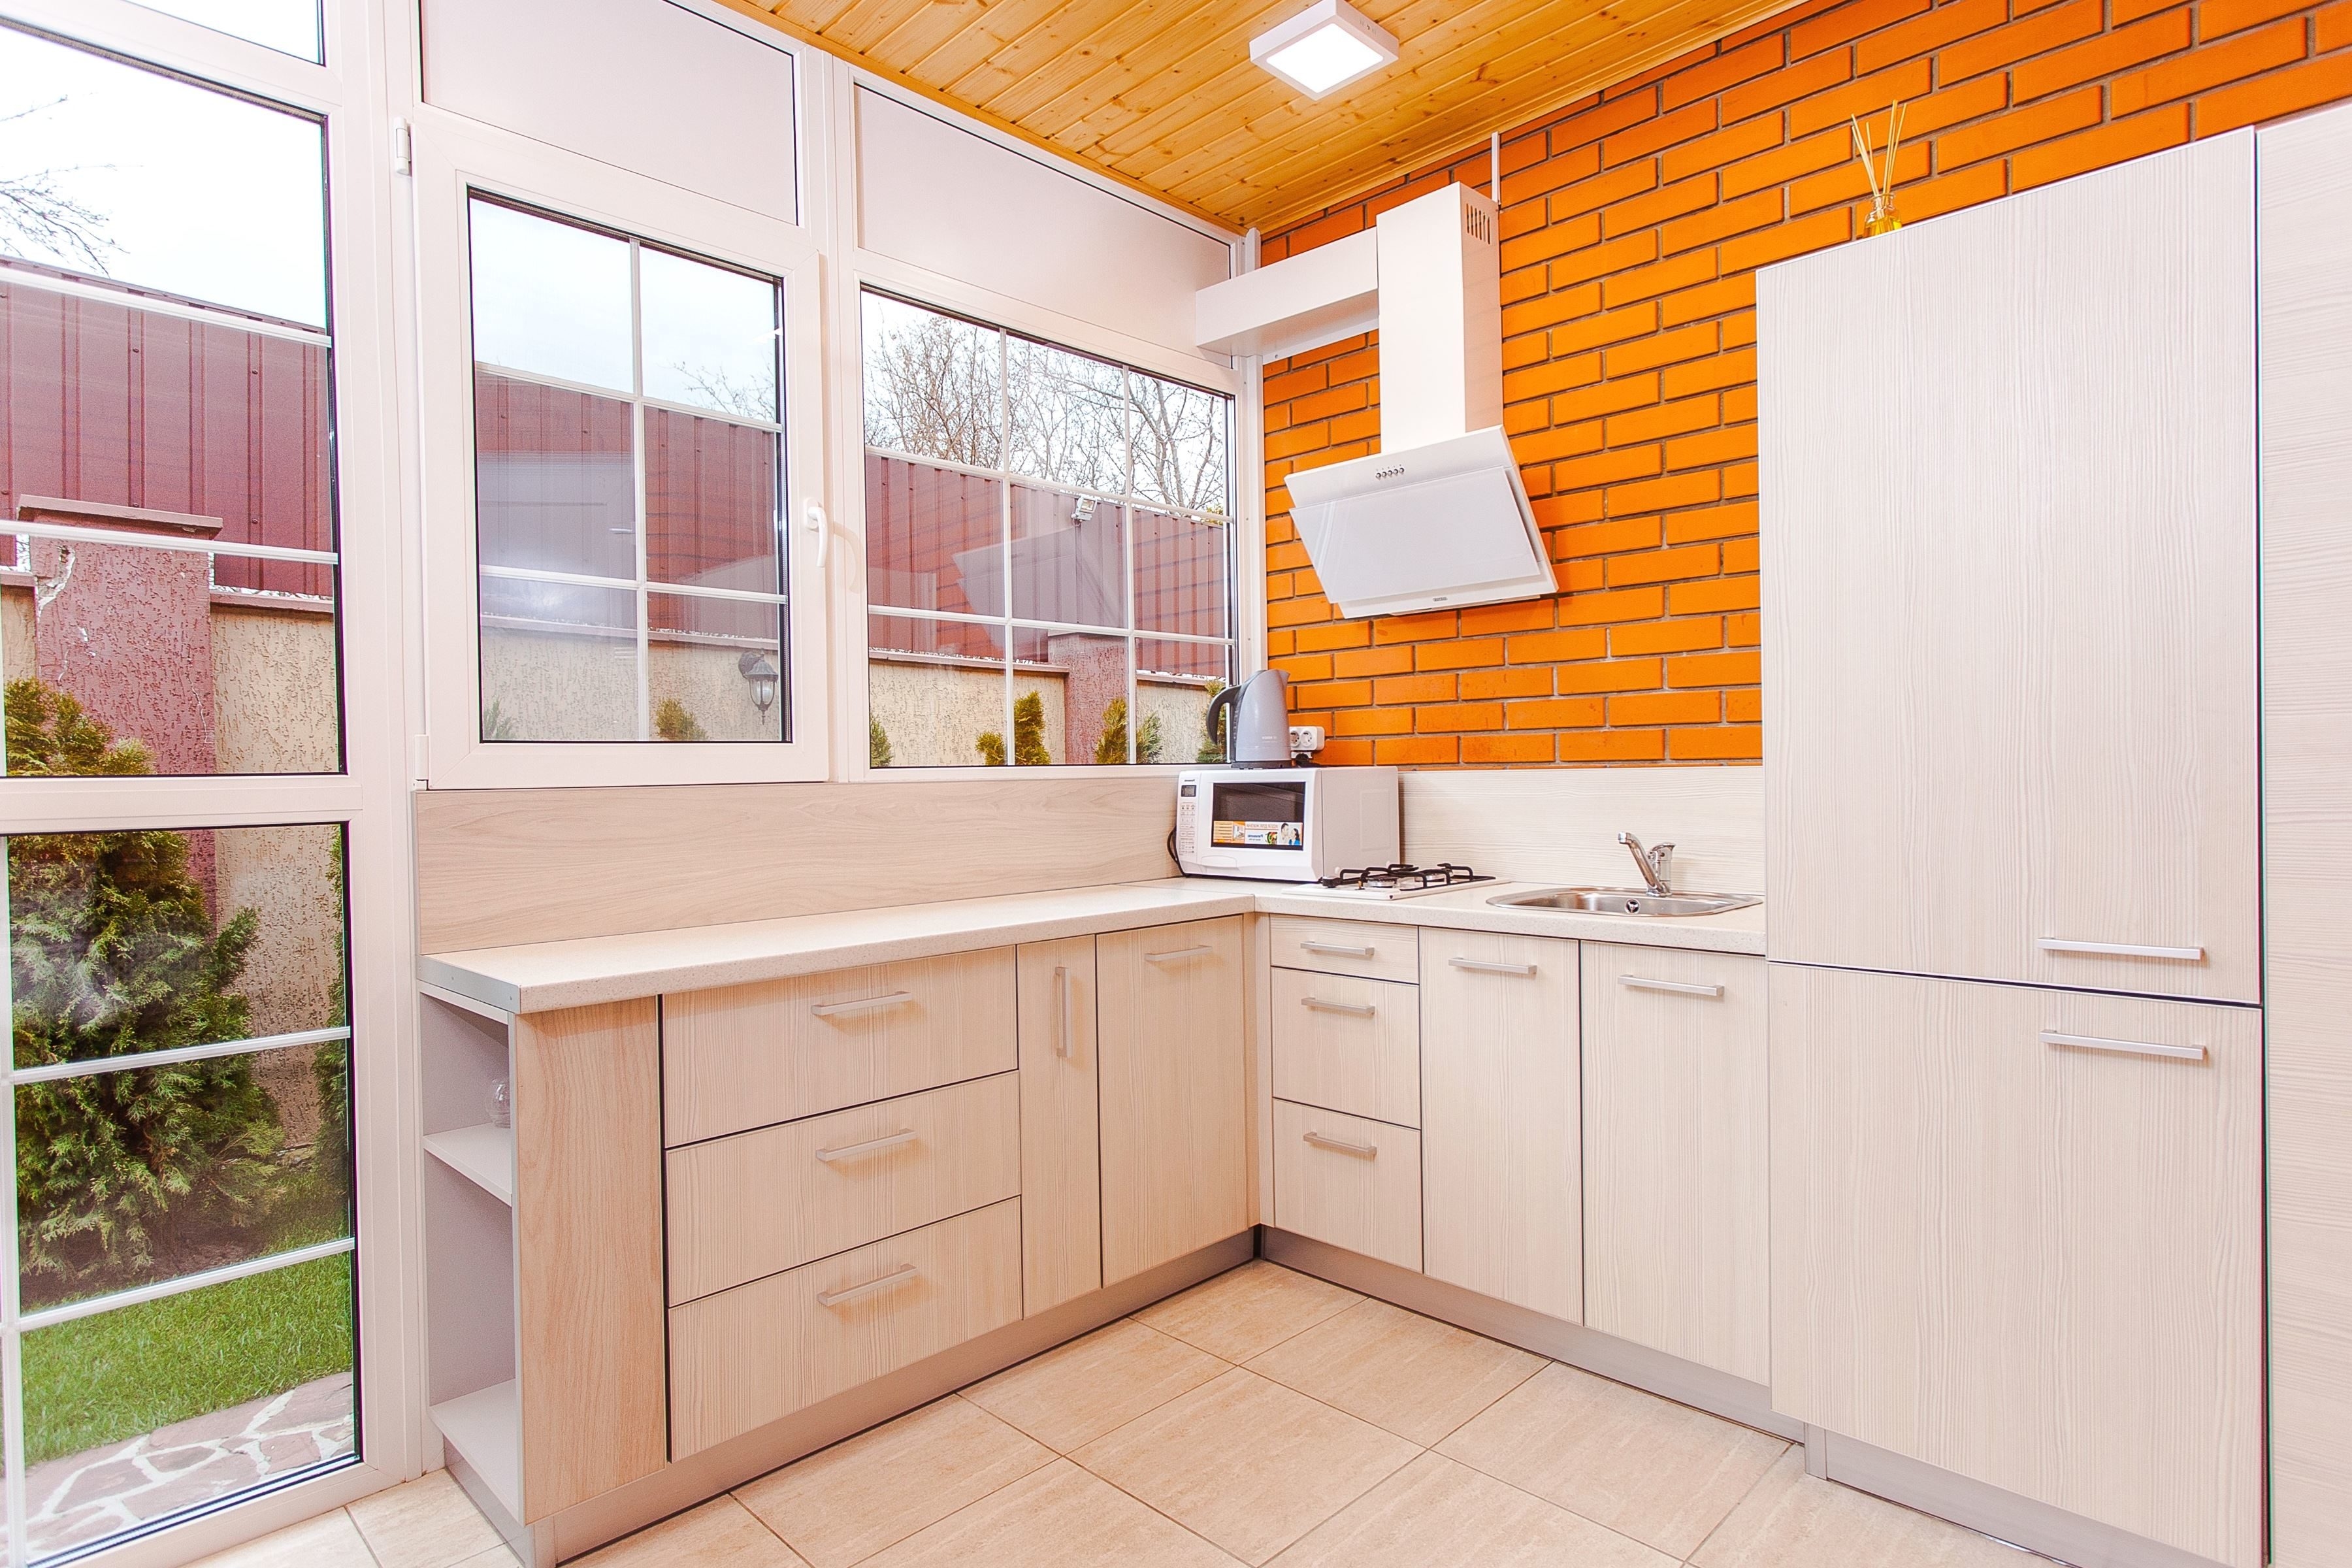 Imagen gratis cocina microondas muebles ventana interior for Interior muebles cocina